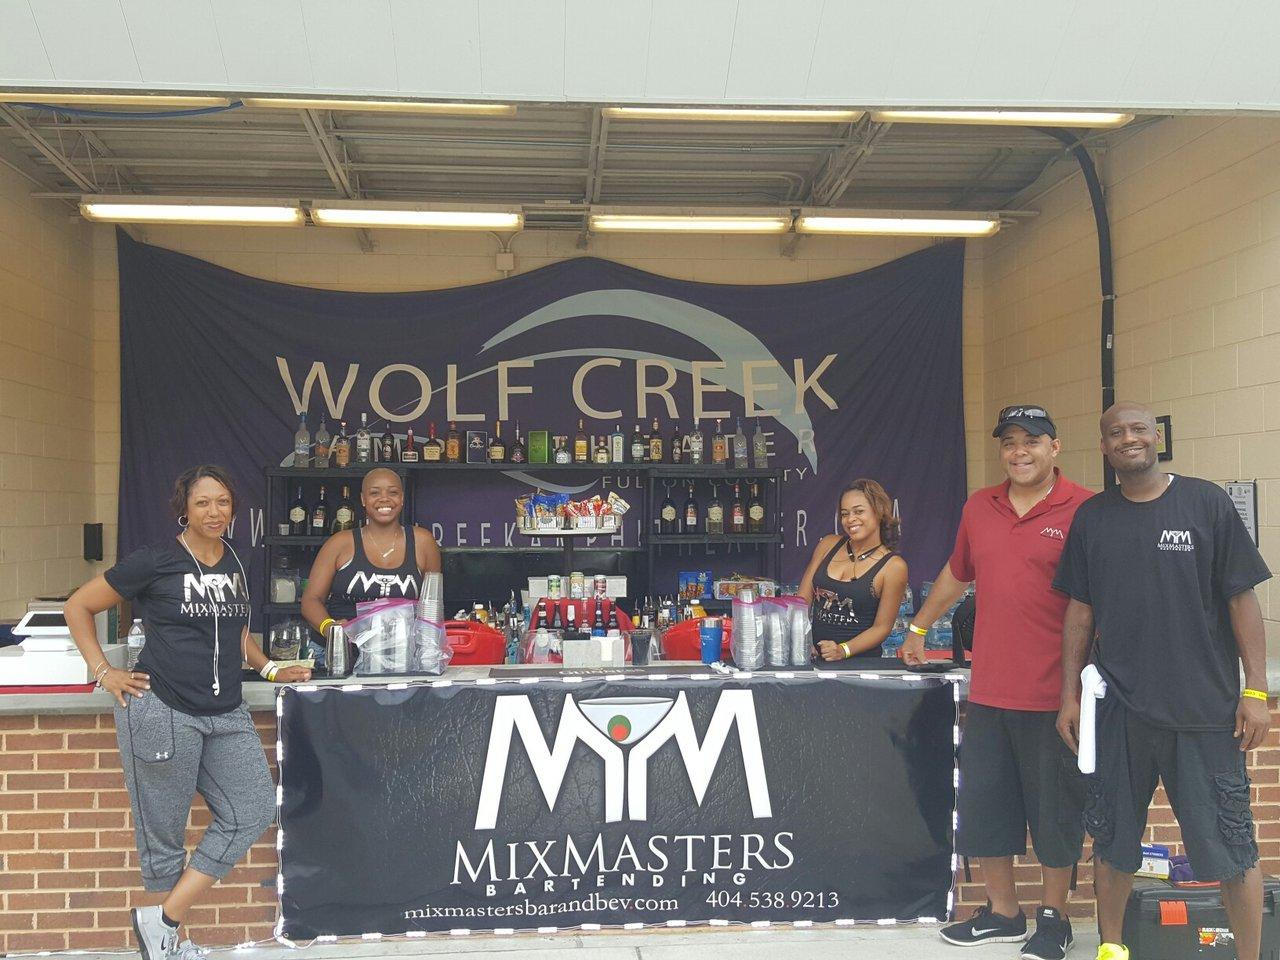 Wolf Creek Concert Series photo WC 07-23-16.jpg